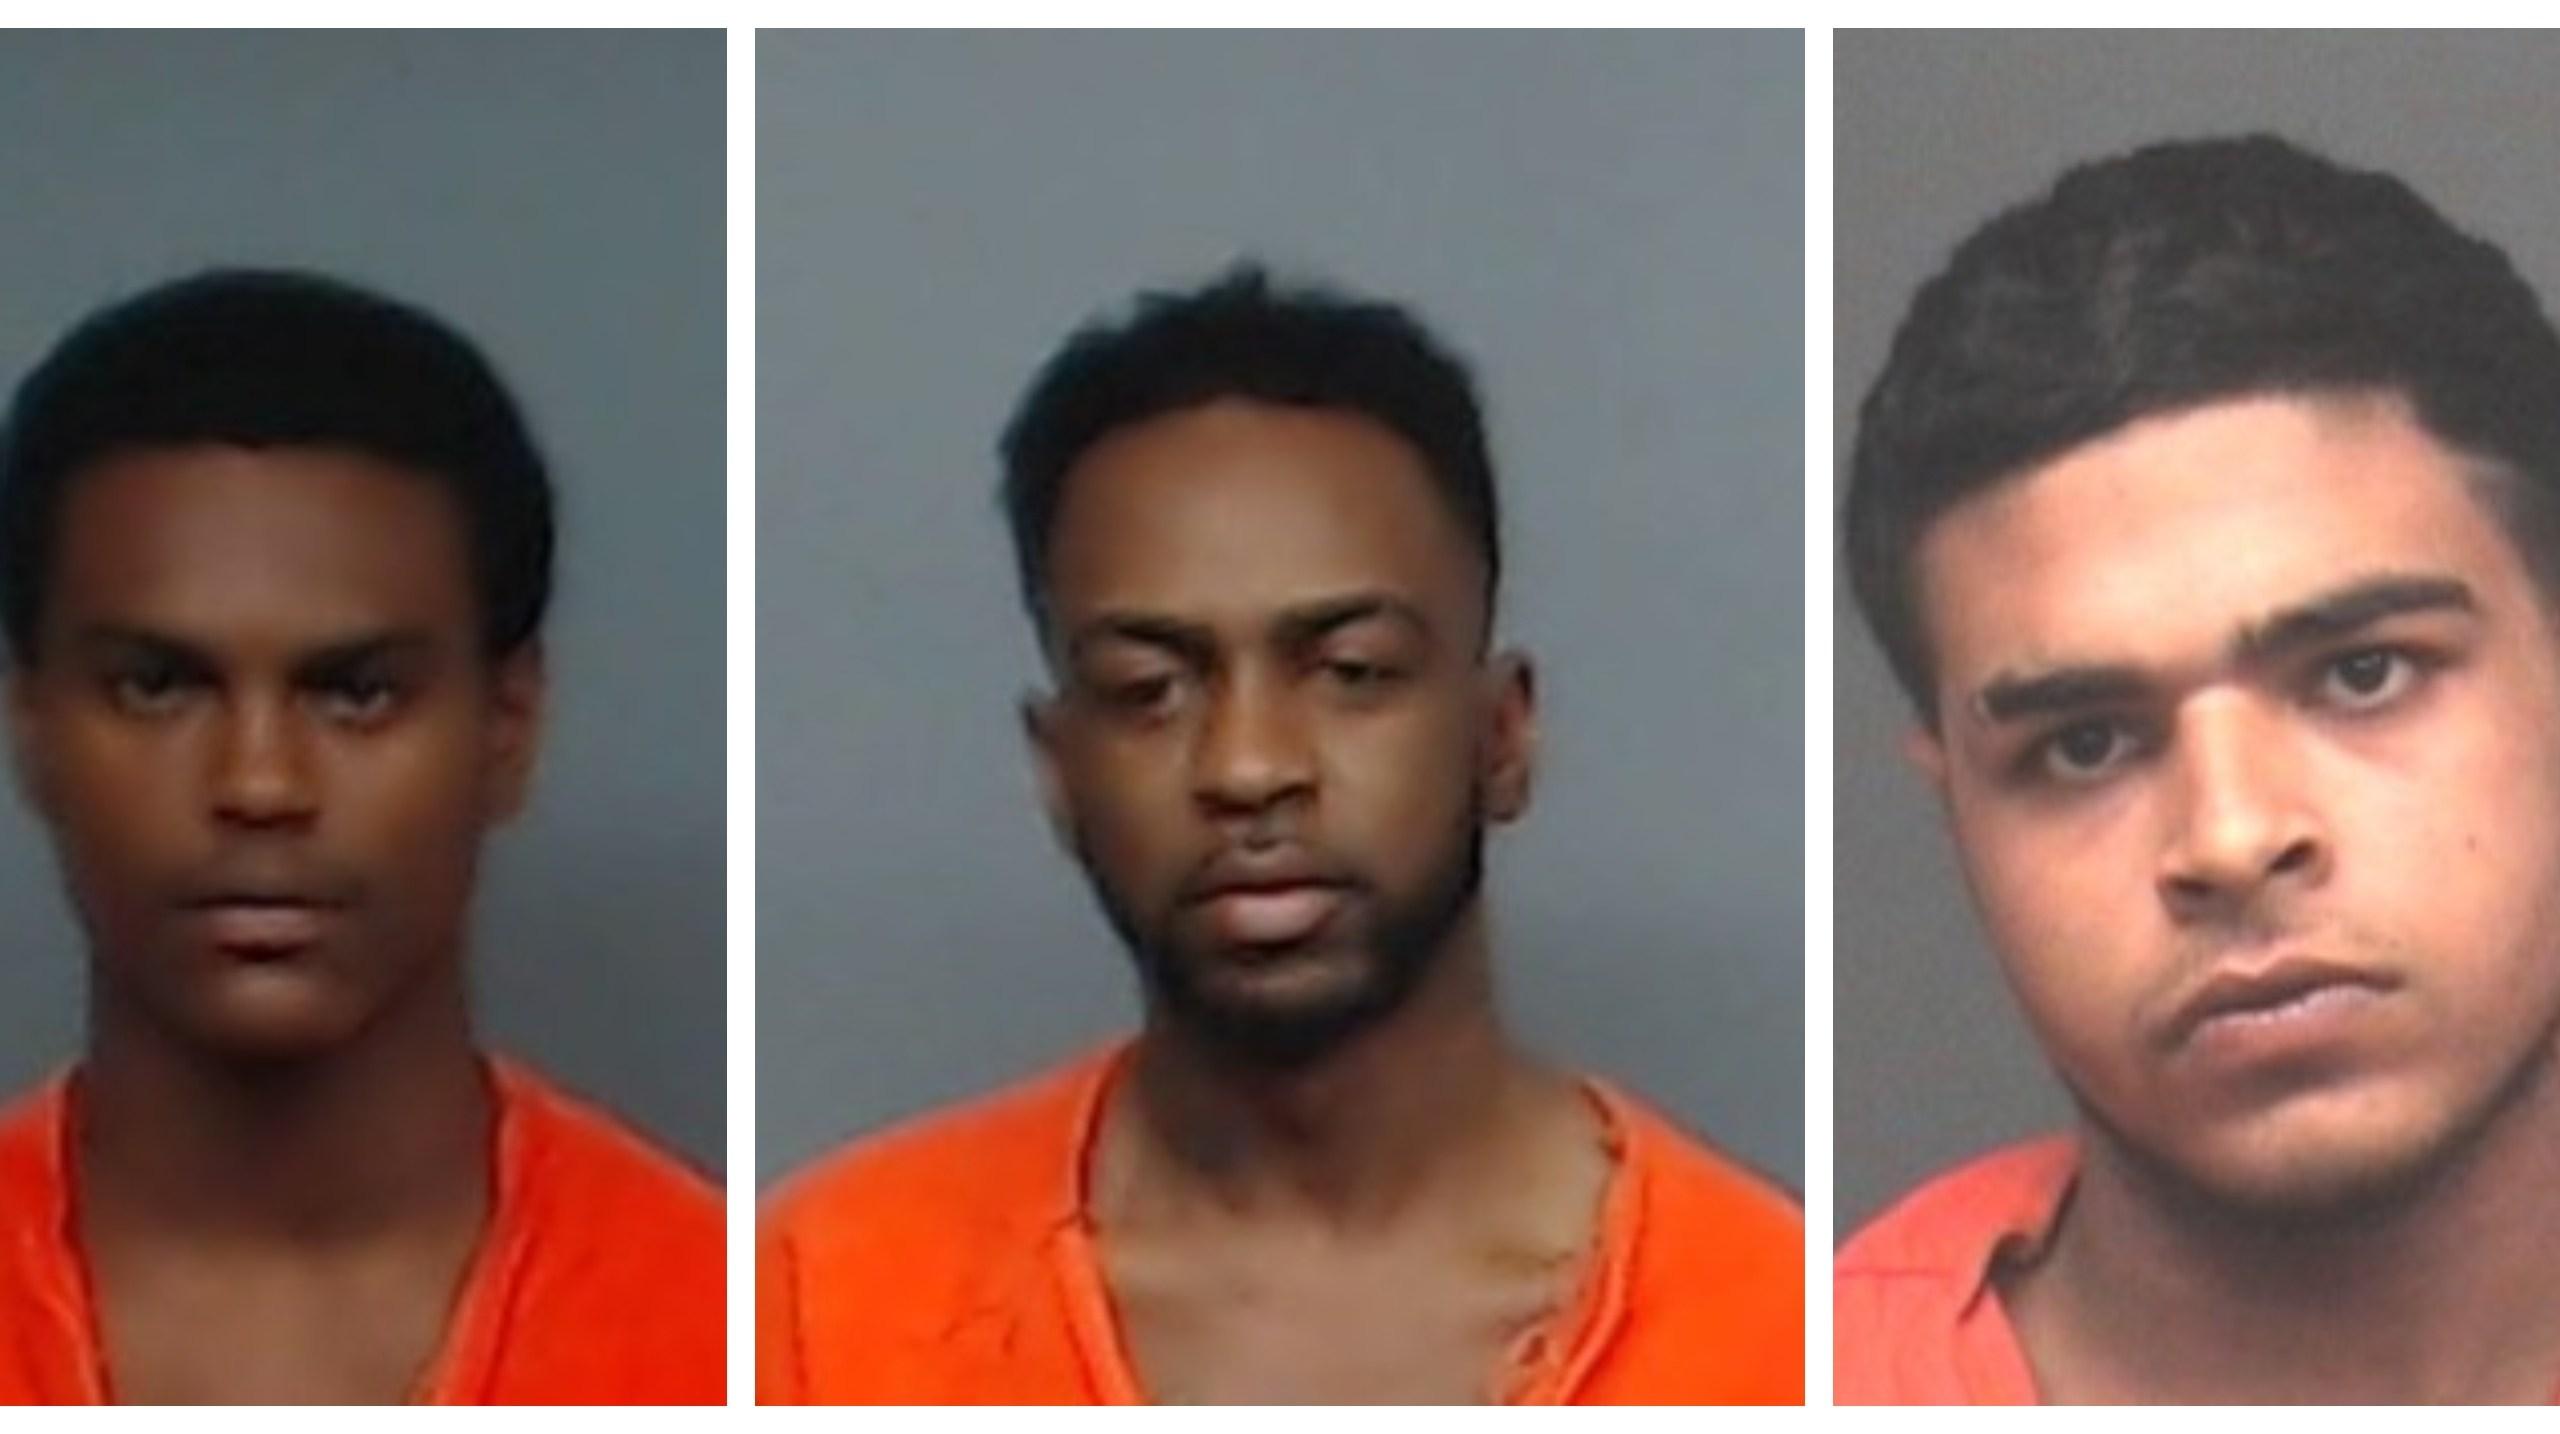 Texarkana drug arrests 04.17.19 (1)_1555536090838.jpg.jpg